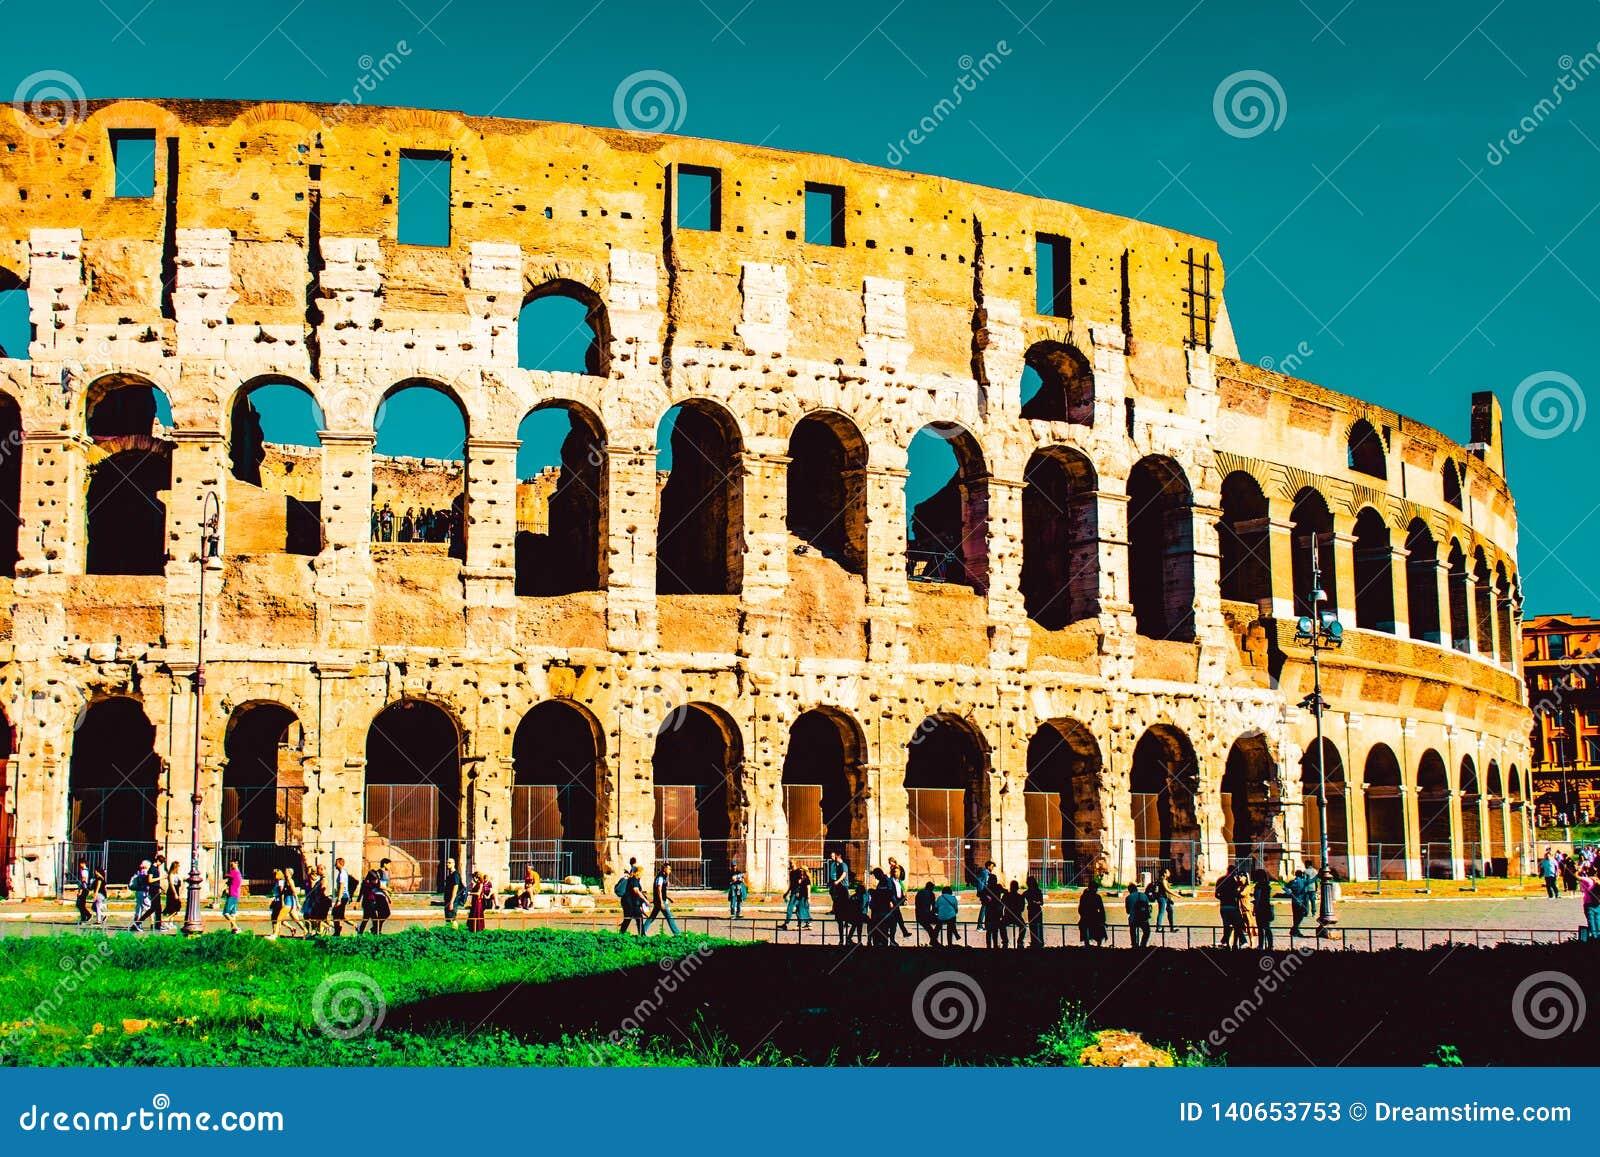 Colosseum Rome Seventh Wonders Of World